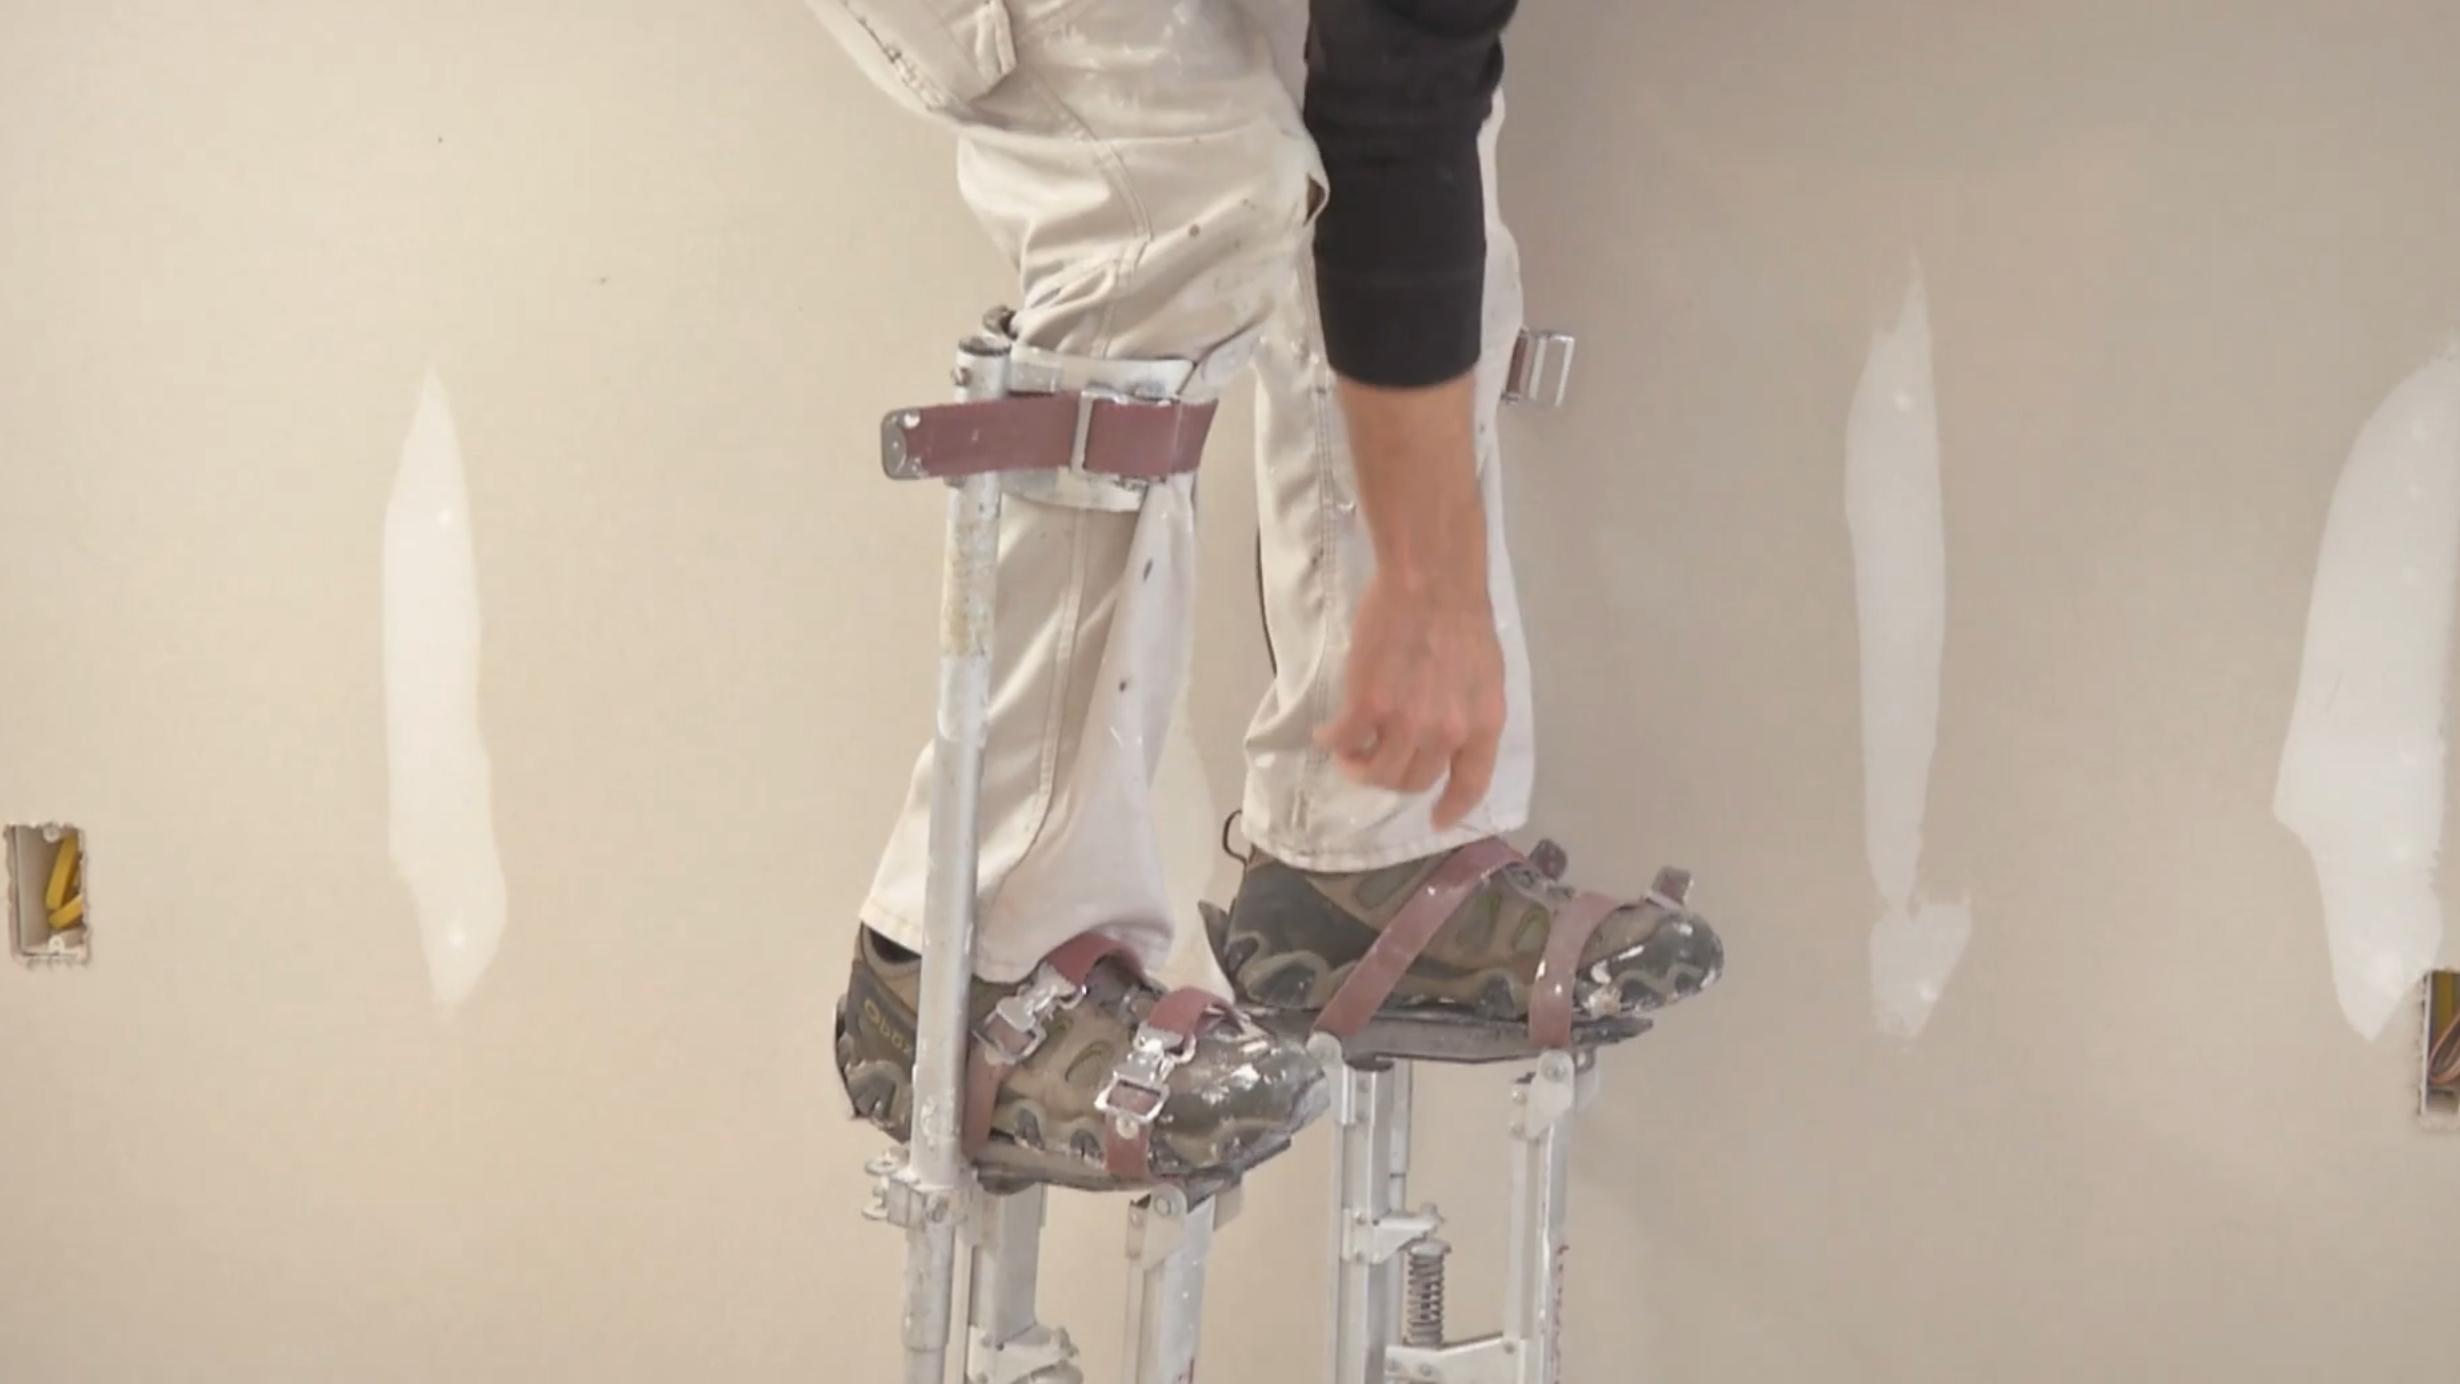 Myron climbing into a pair of metal stilts